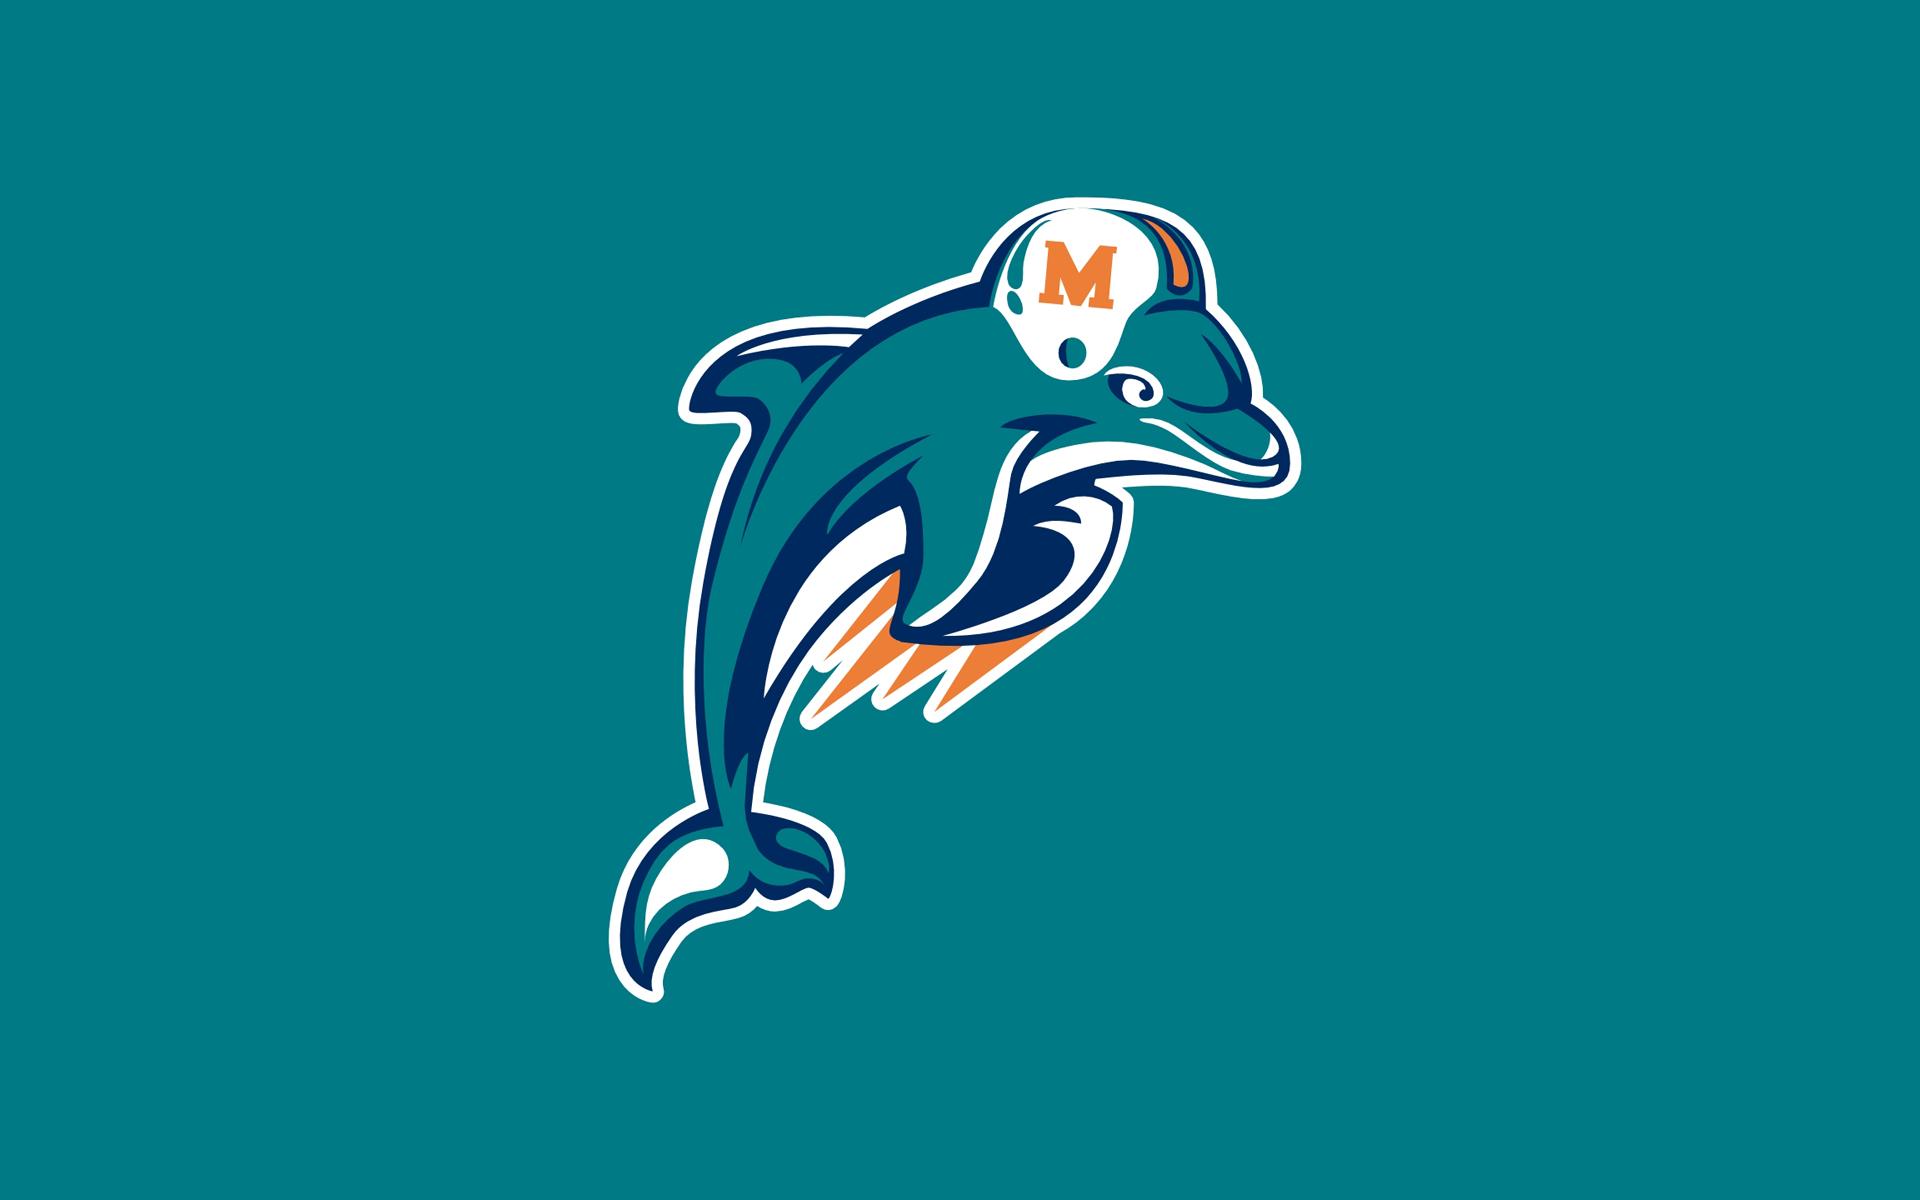 Miami dolphins wallpaper 14703 1920x1200 px hdwallsource miami dolphins wallpaper 14703 voltagebd Image collections